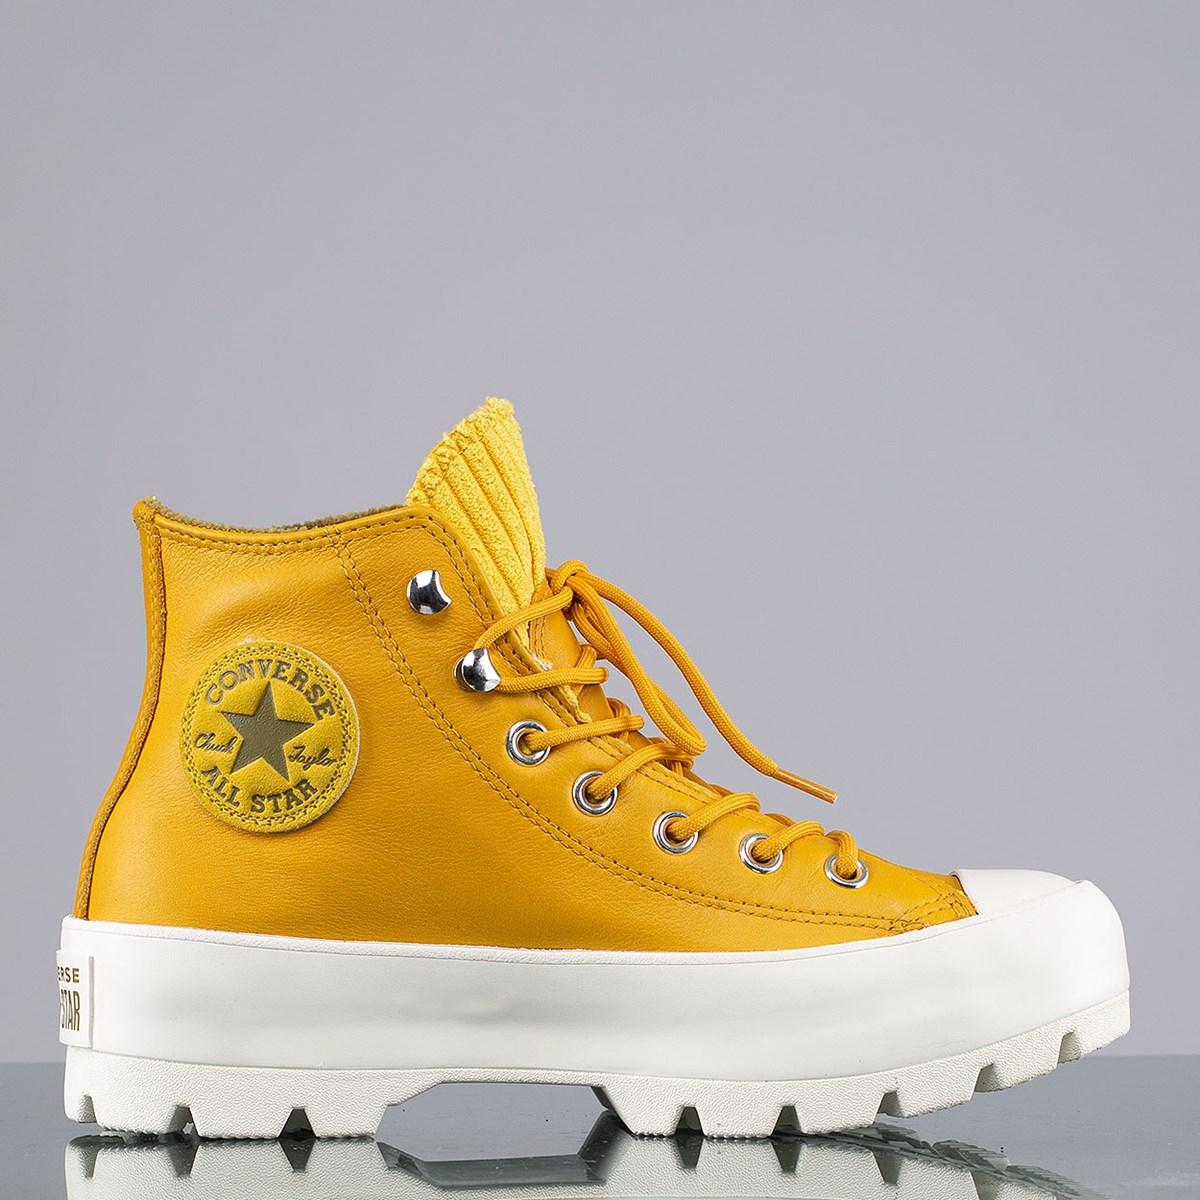 Tênis Converse Chuck Taylor All Star Lugged Winter Mountain Hi Gold Dart Olive Flak 565005C